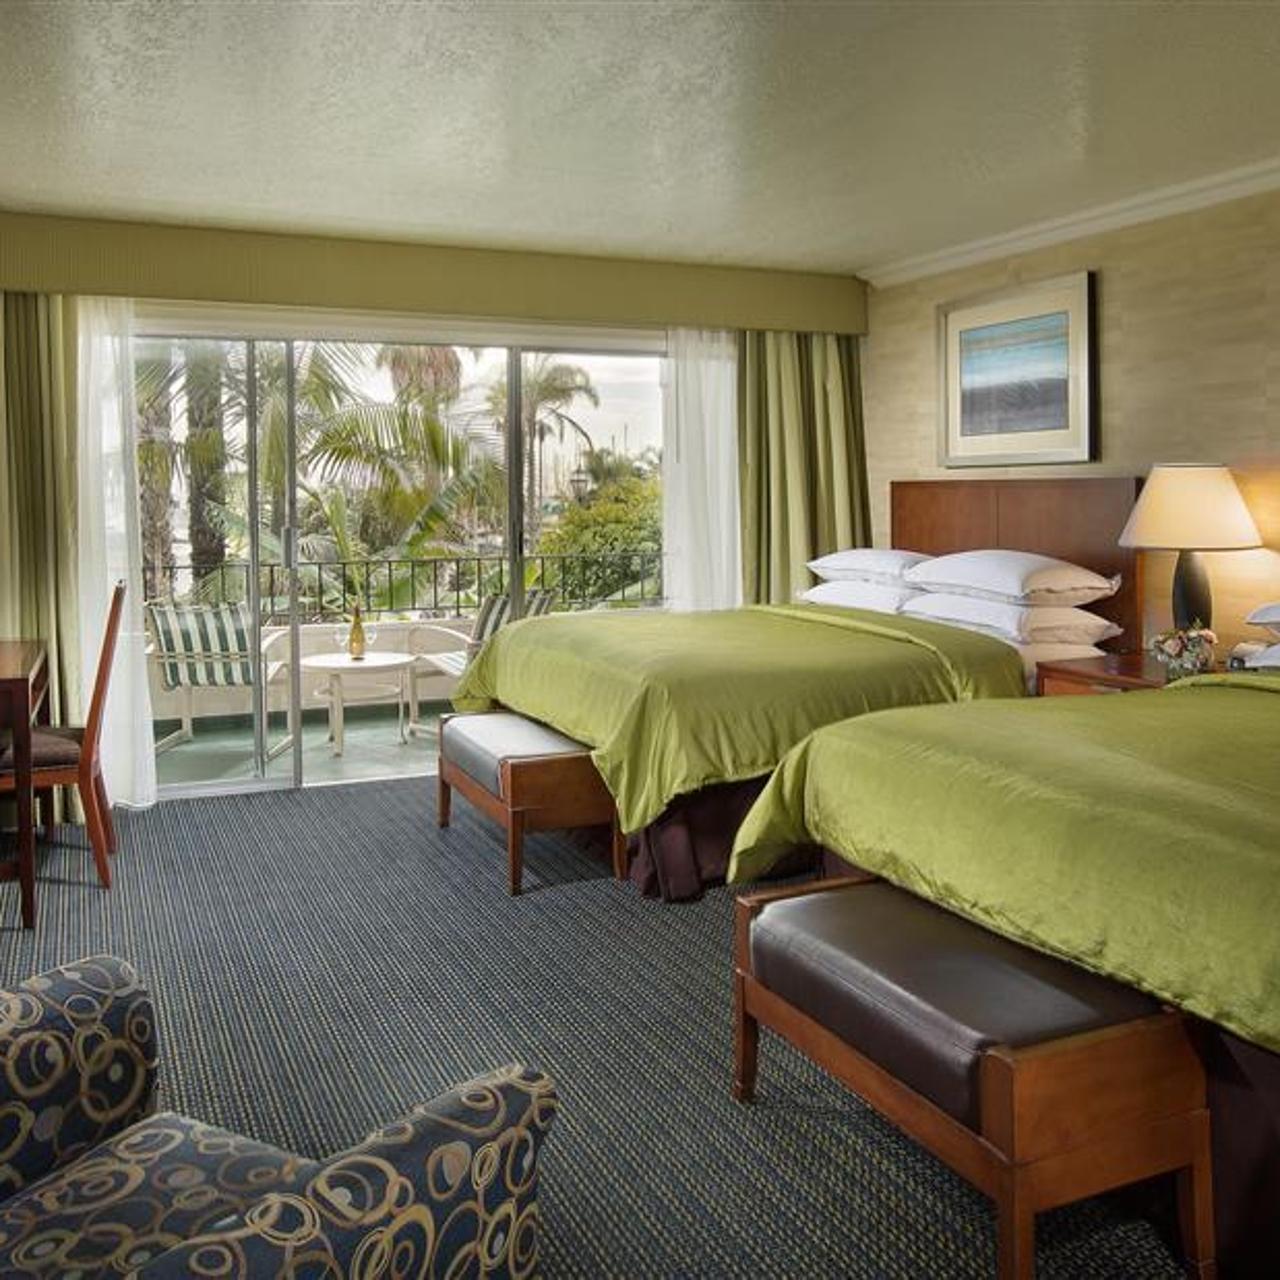 West Beach Inn A Coast Hotel In Santa